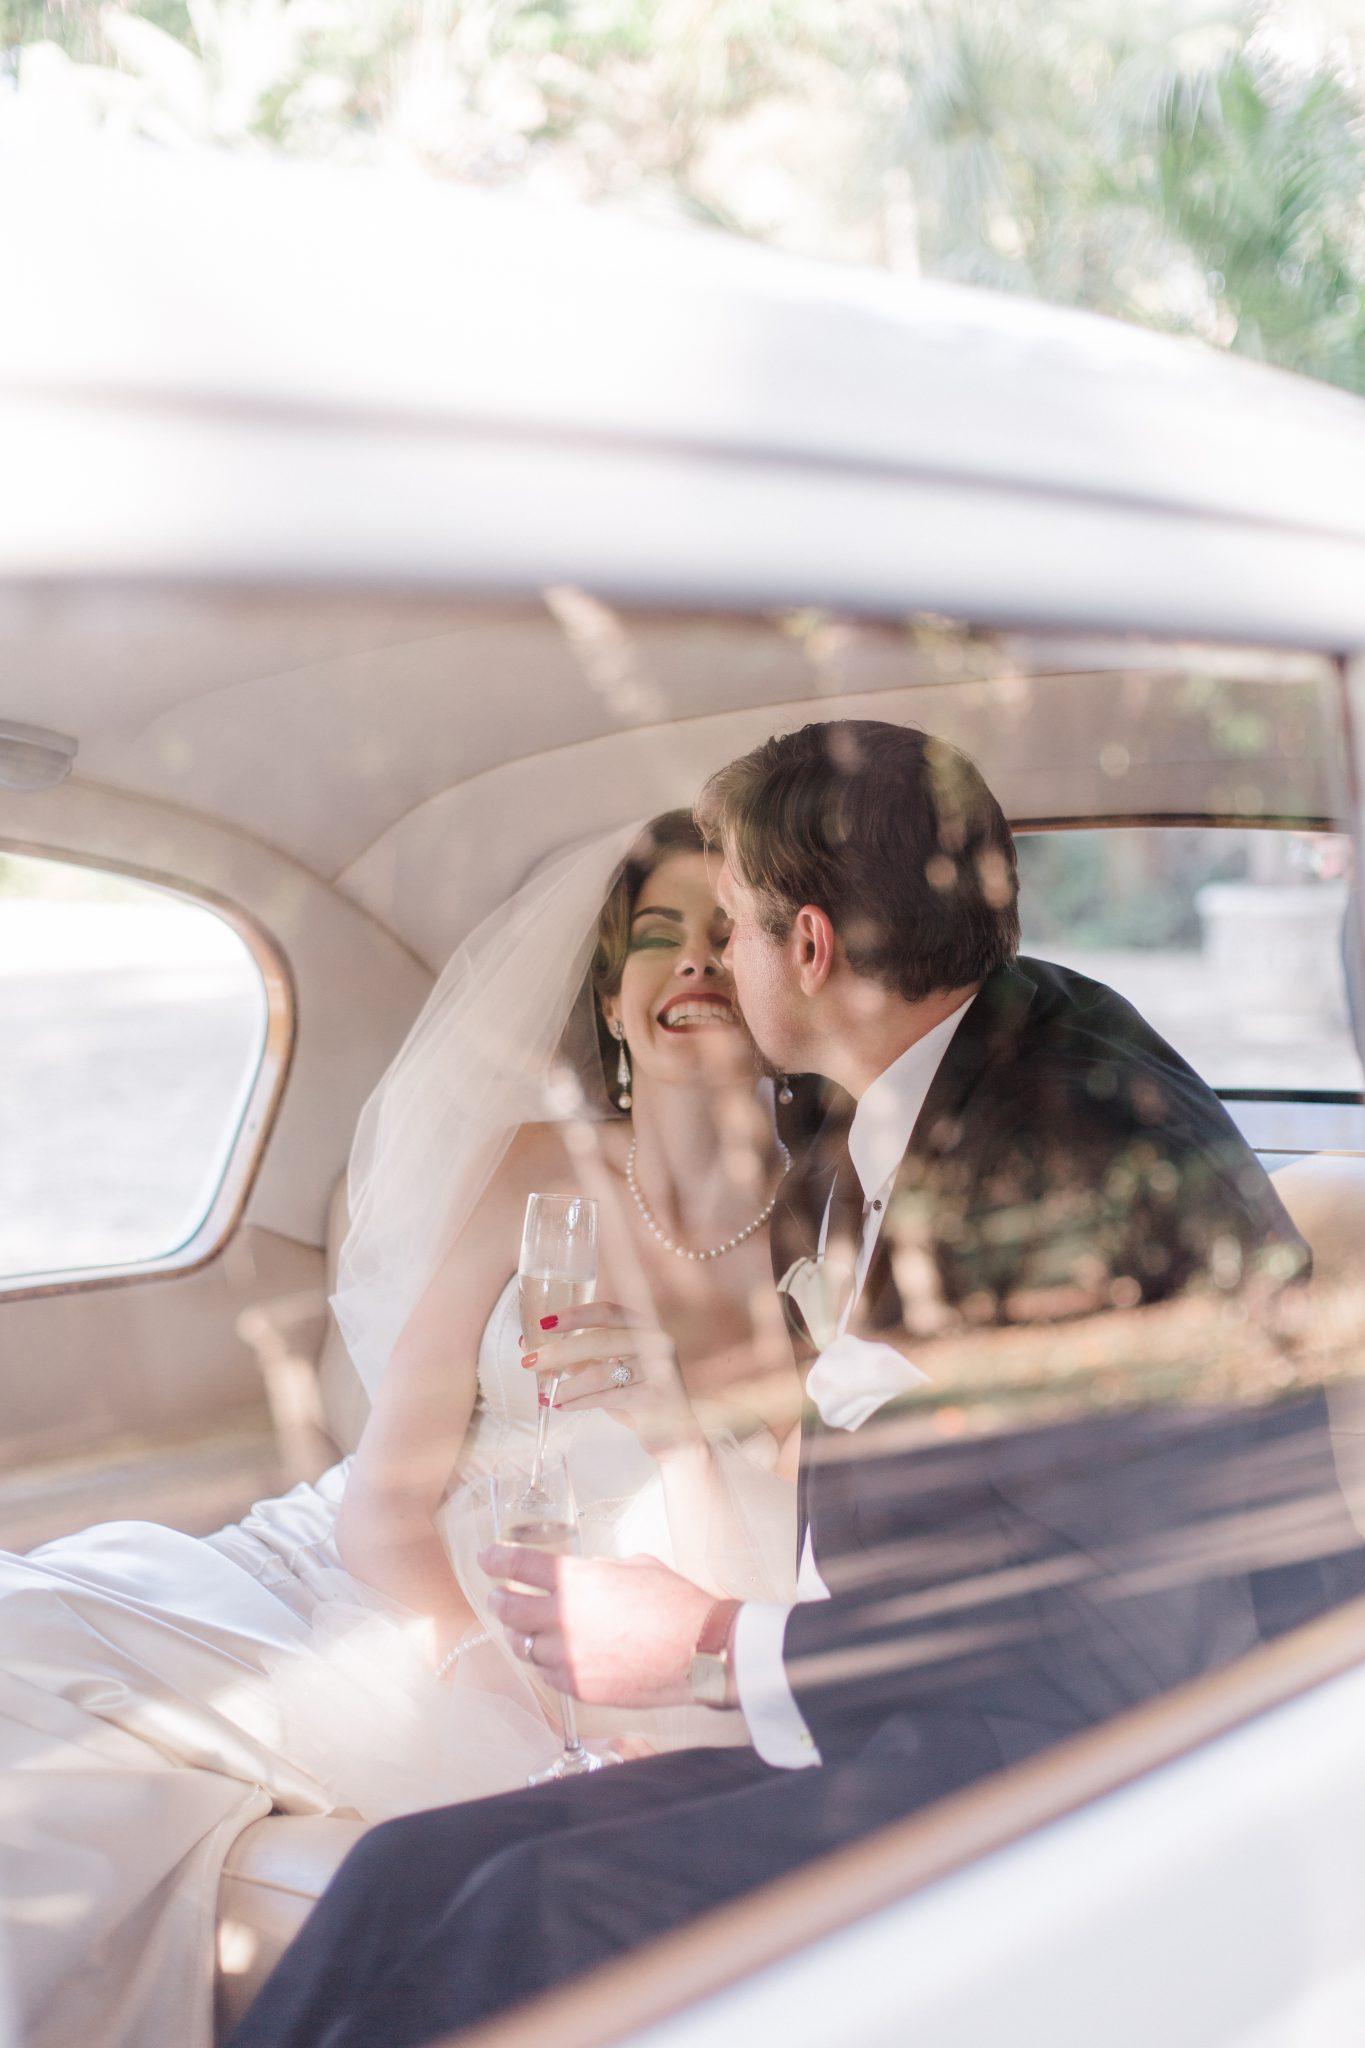 marine_gomez_photographe_mariage_Fontainebleau_Paris_JD1